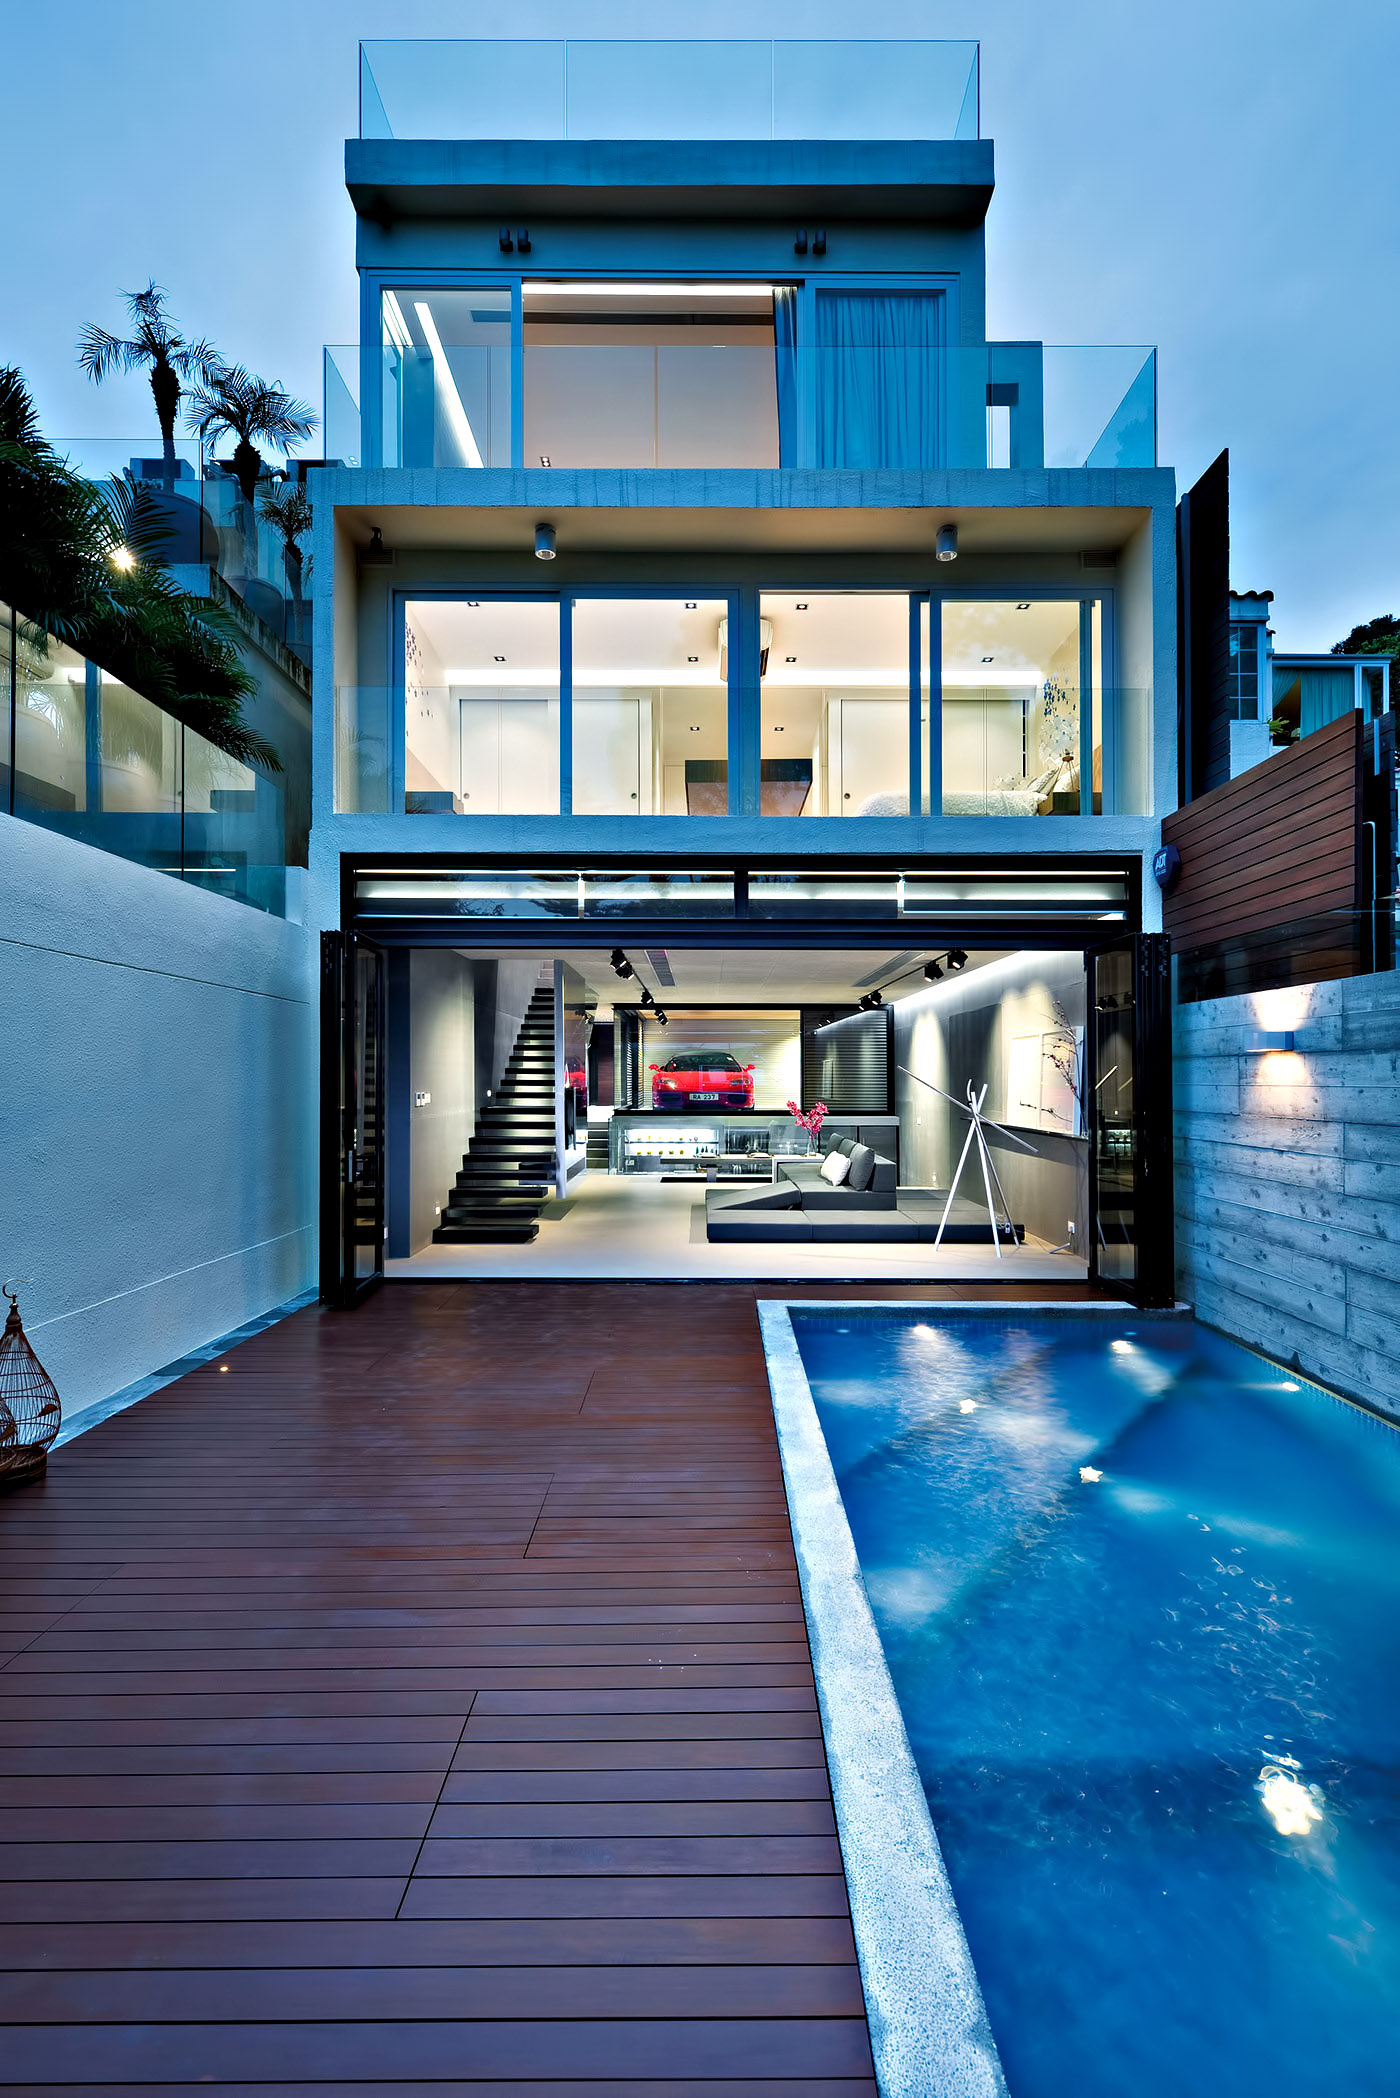 Sai Kung Luxury Residence – New Territories, Hong Kong, China